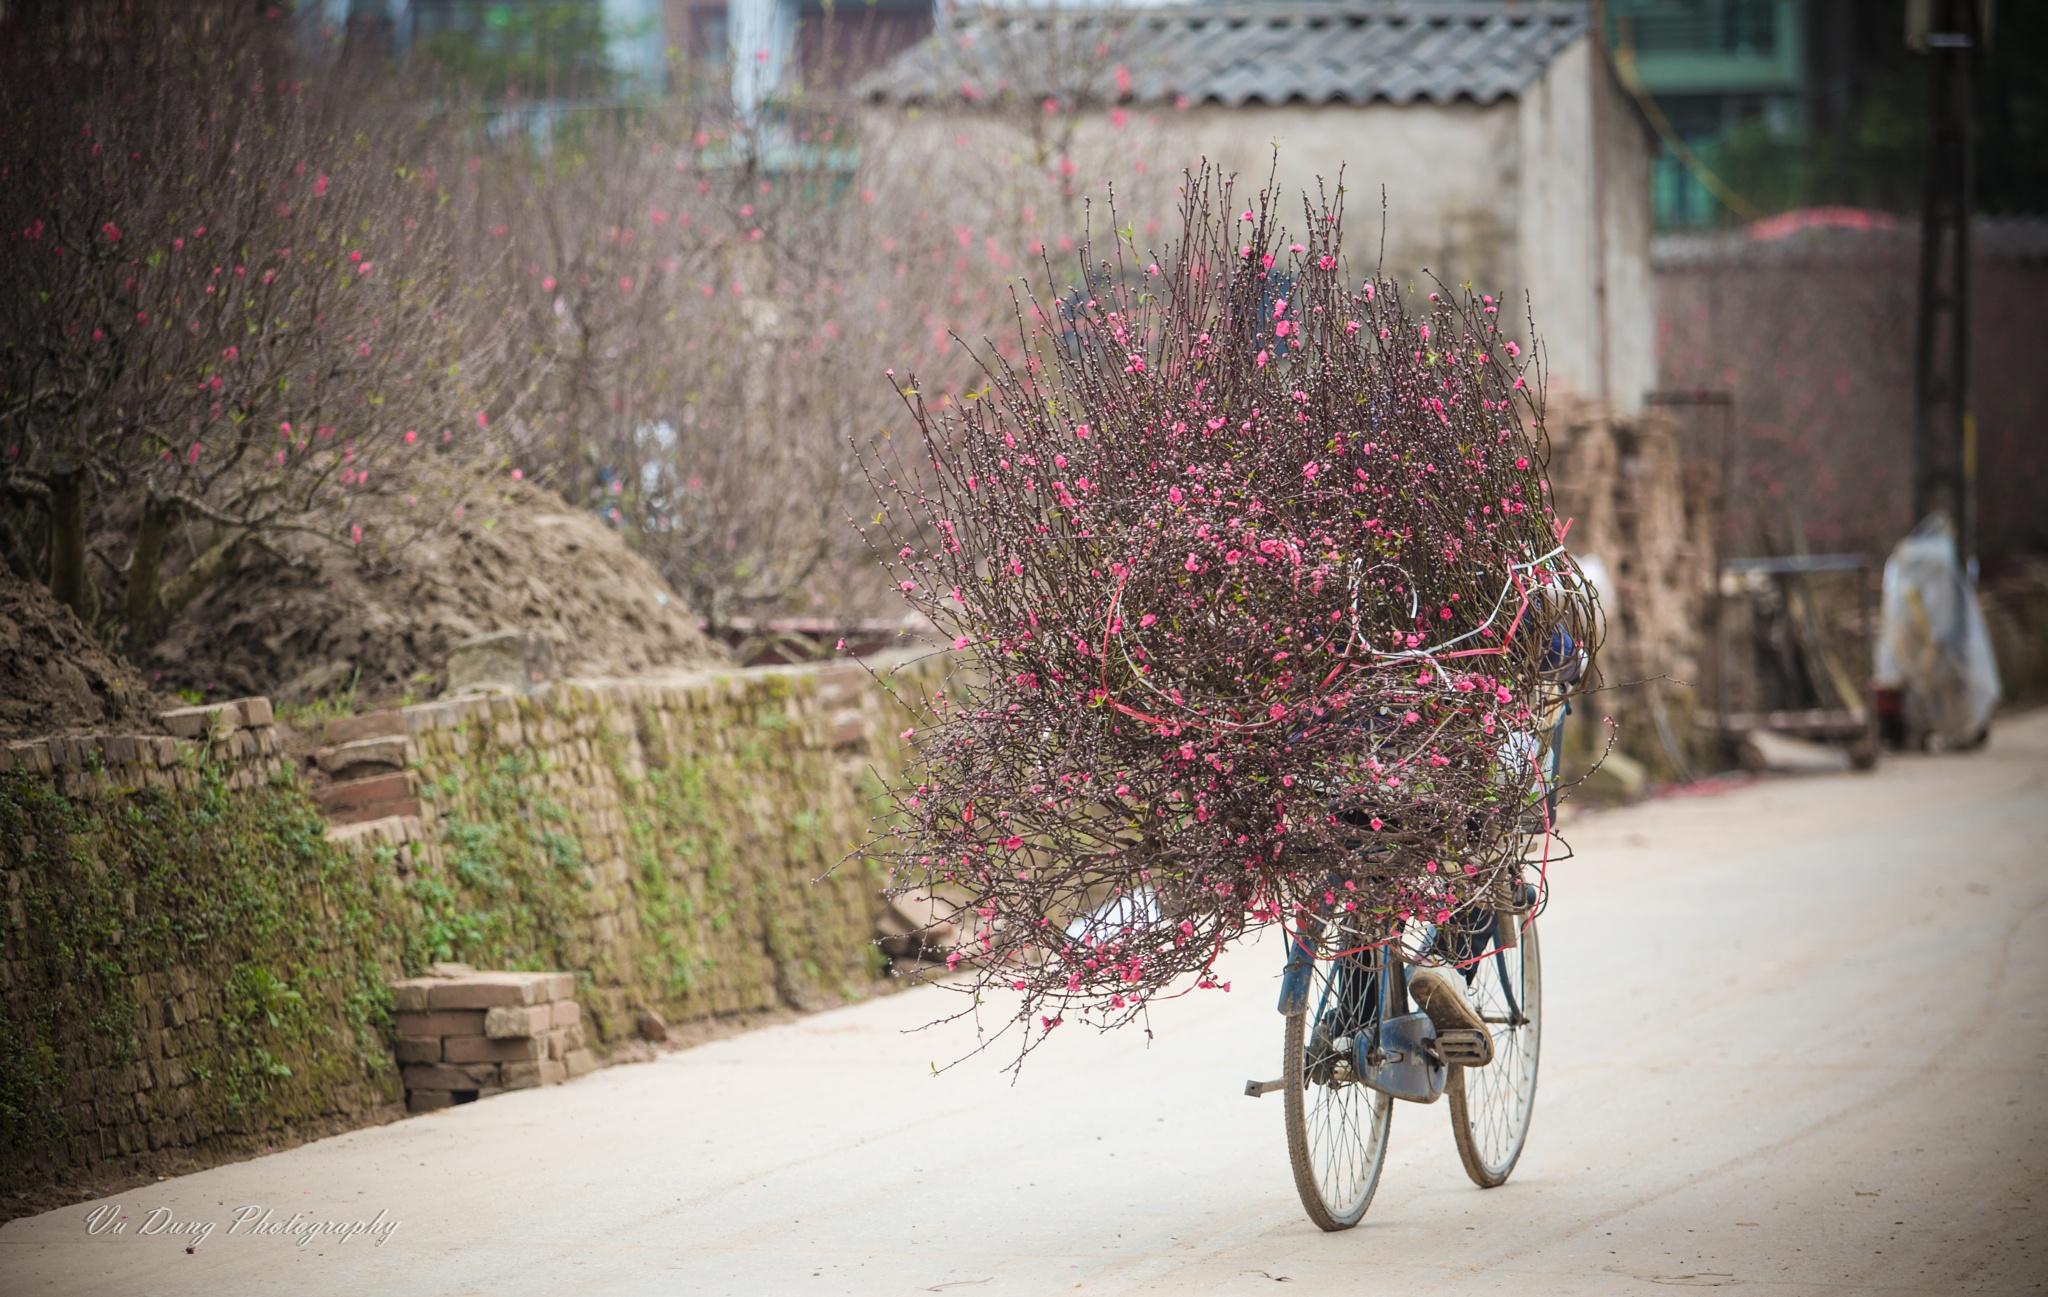 Bring spring to street by Vu Ngoc Dung